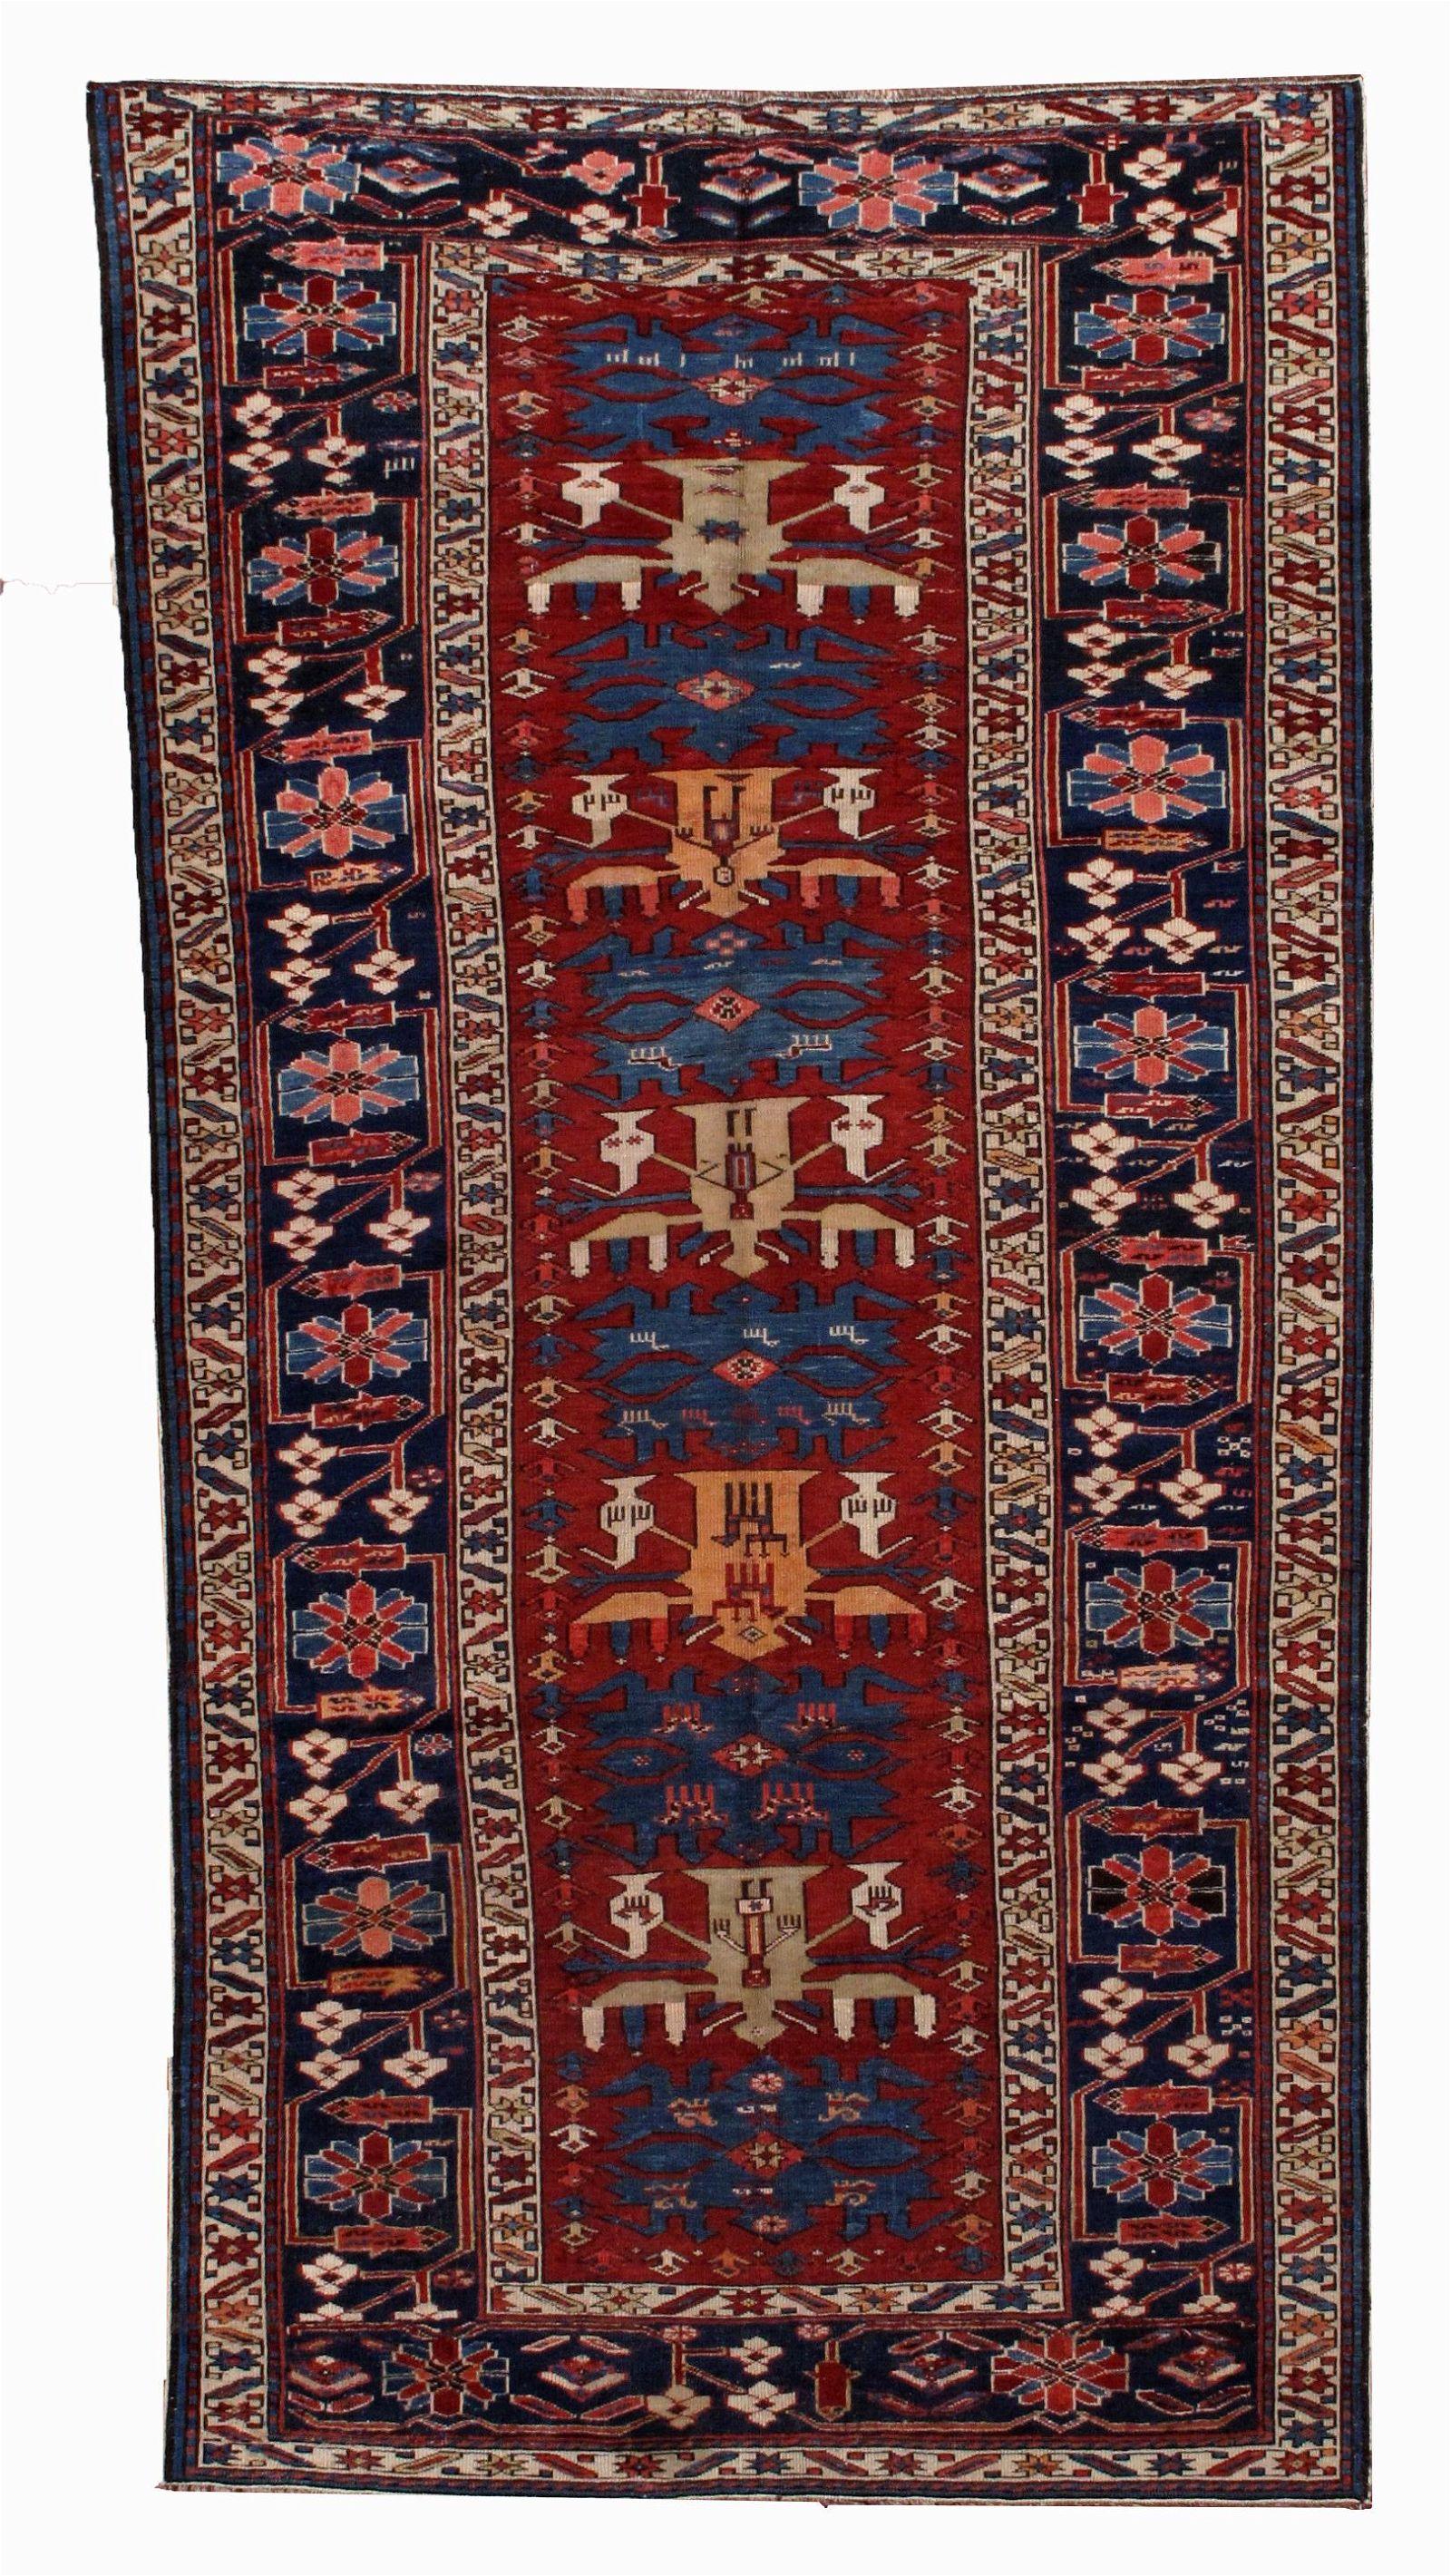 Handmade antique Caucasian Azerbaijani Shirvan rug 4.4'